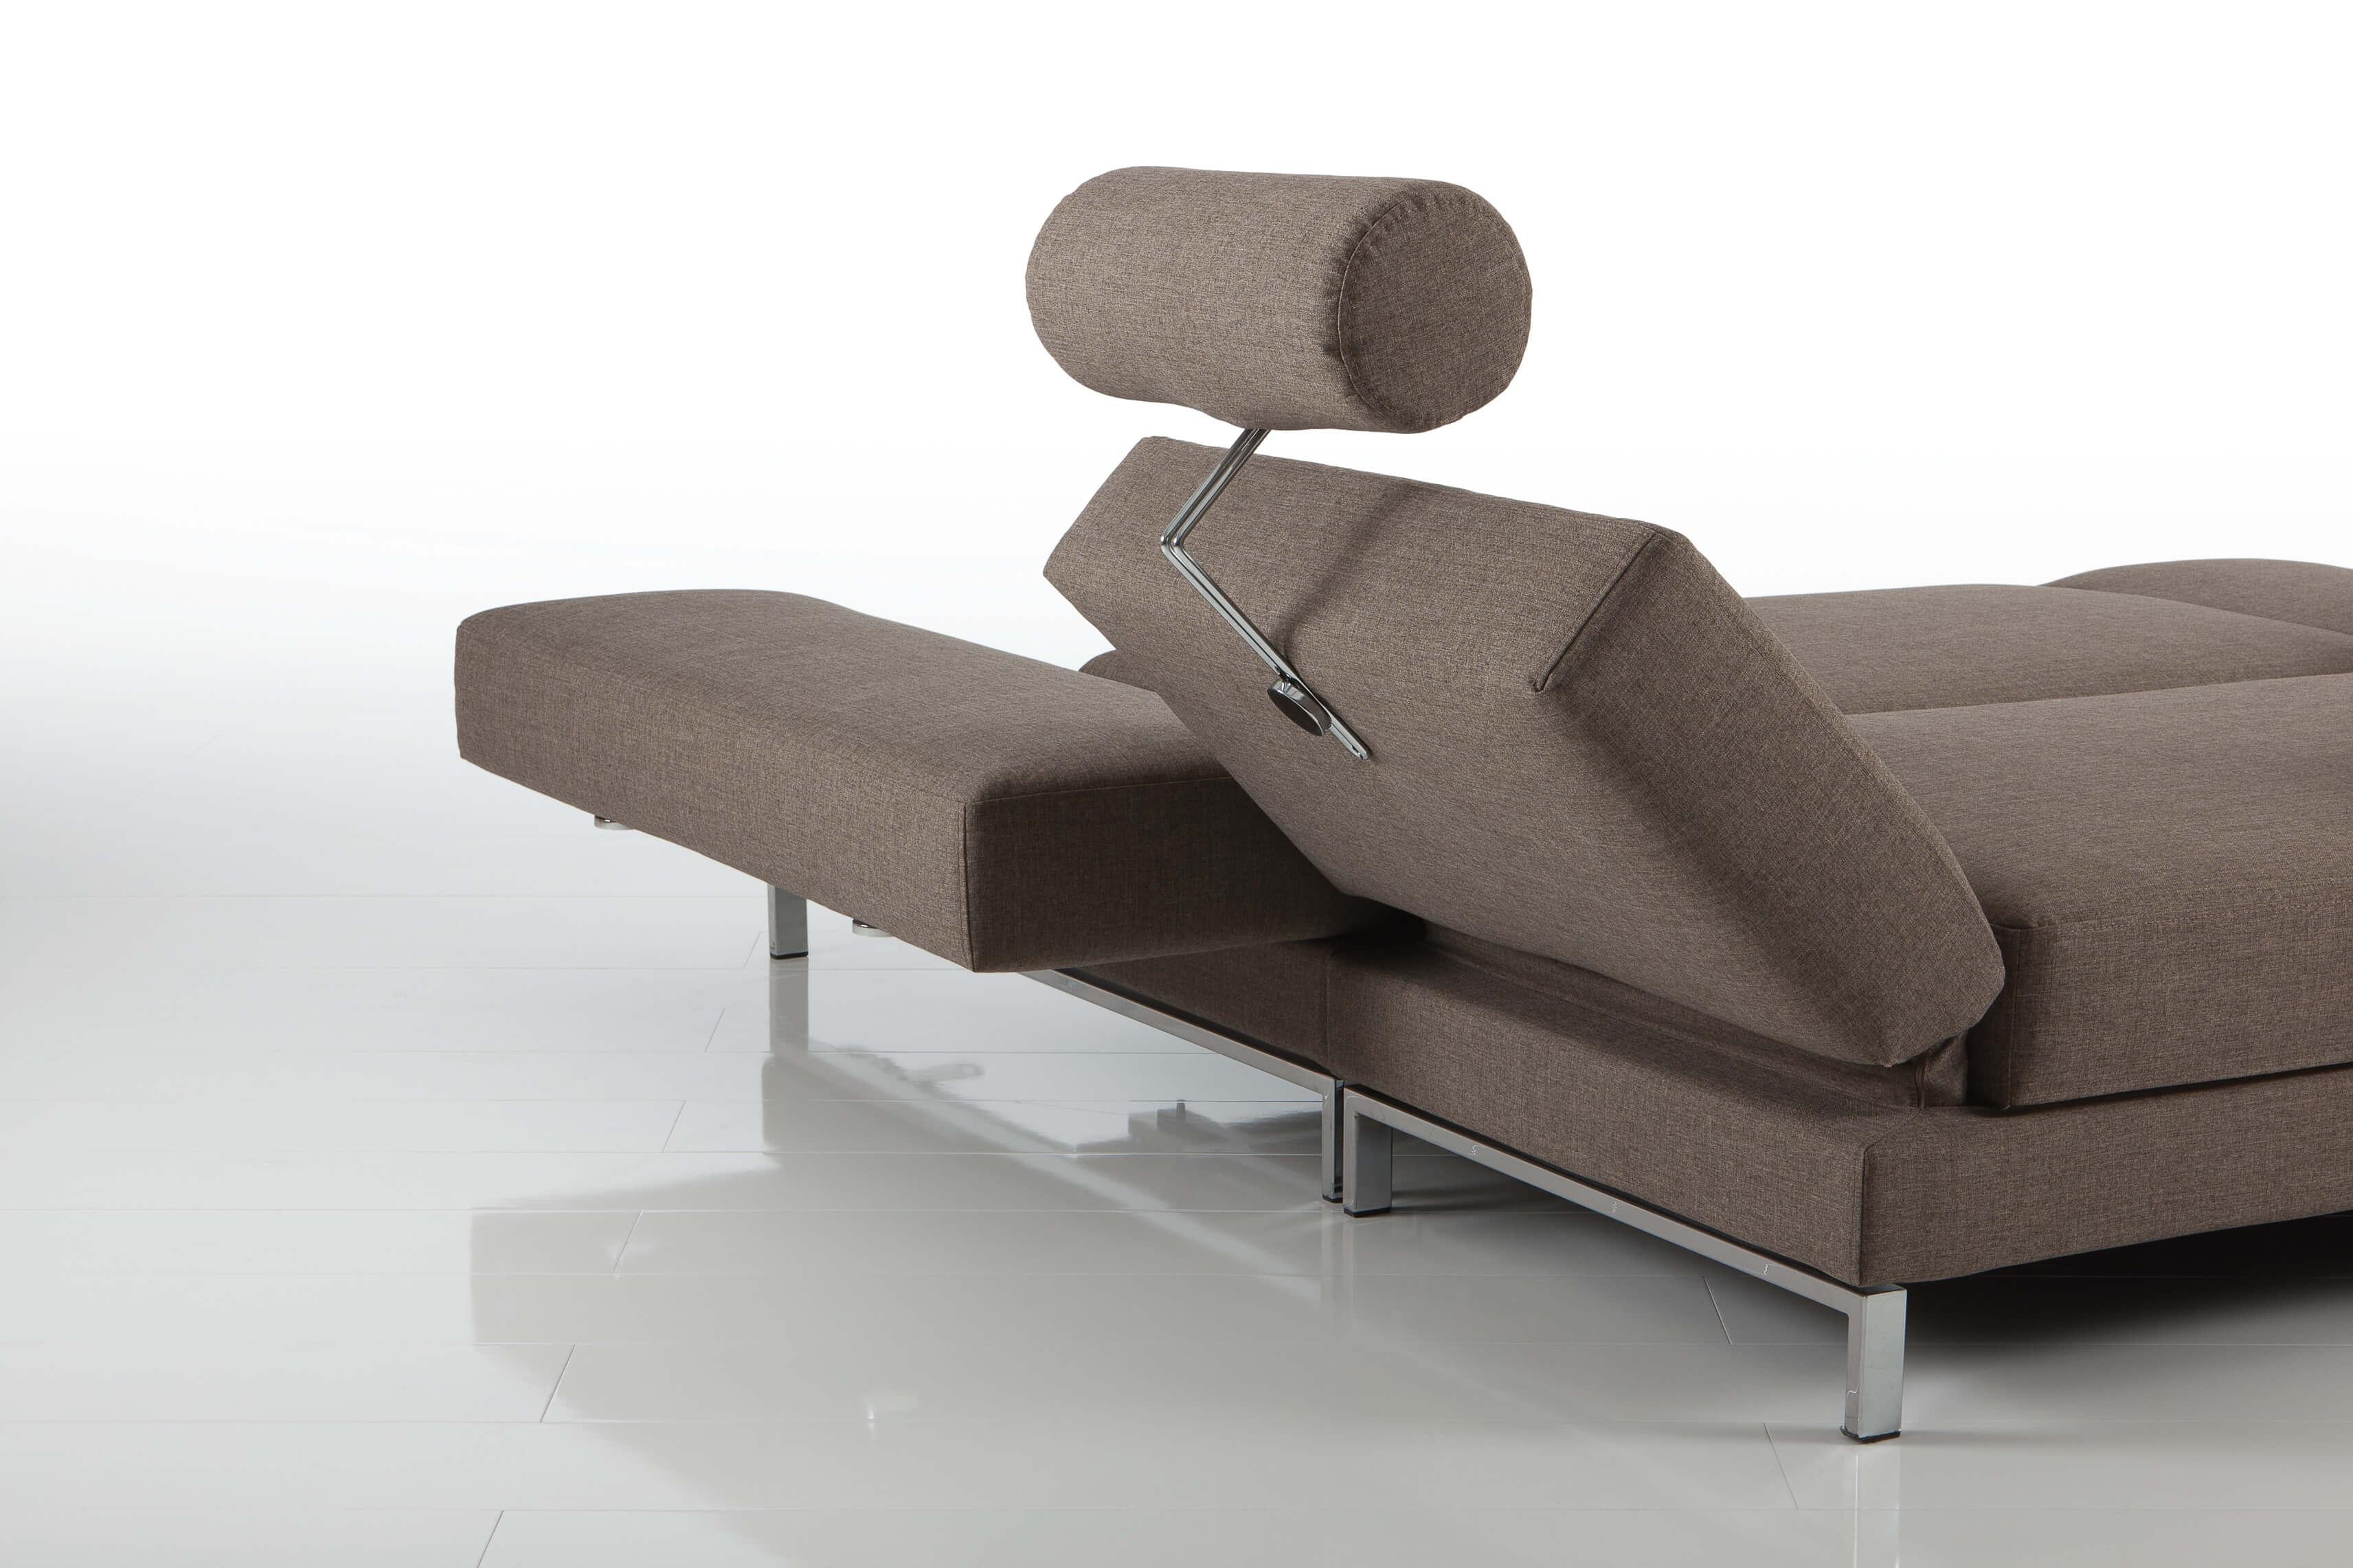 sofa four two von br hl sippold. Black Bedroom Furniture Sets. Home Design Ideas